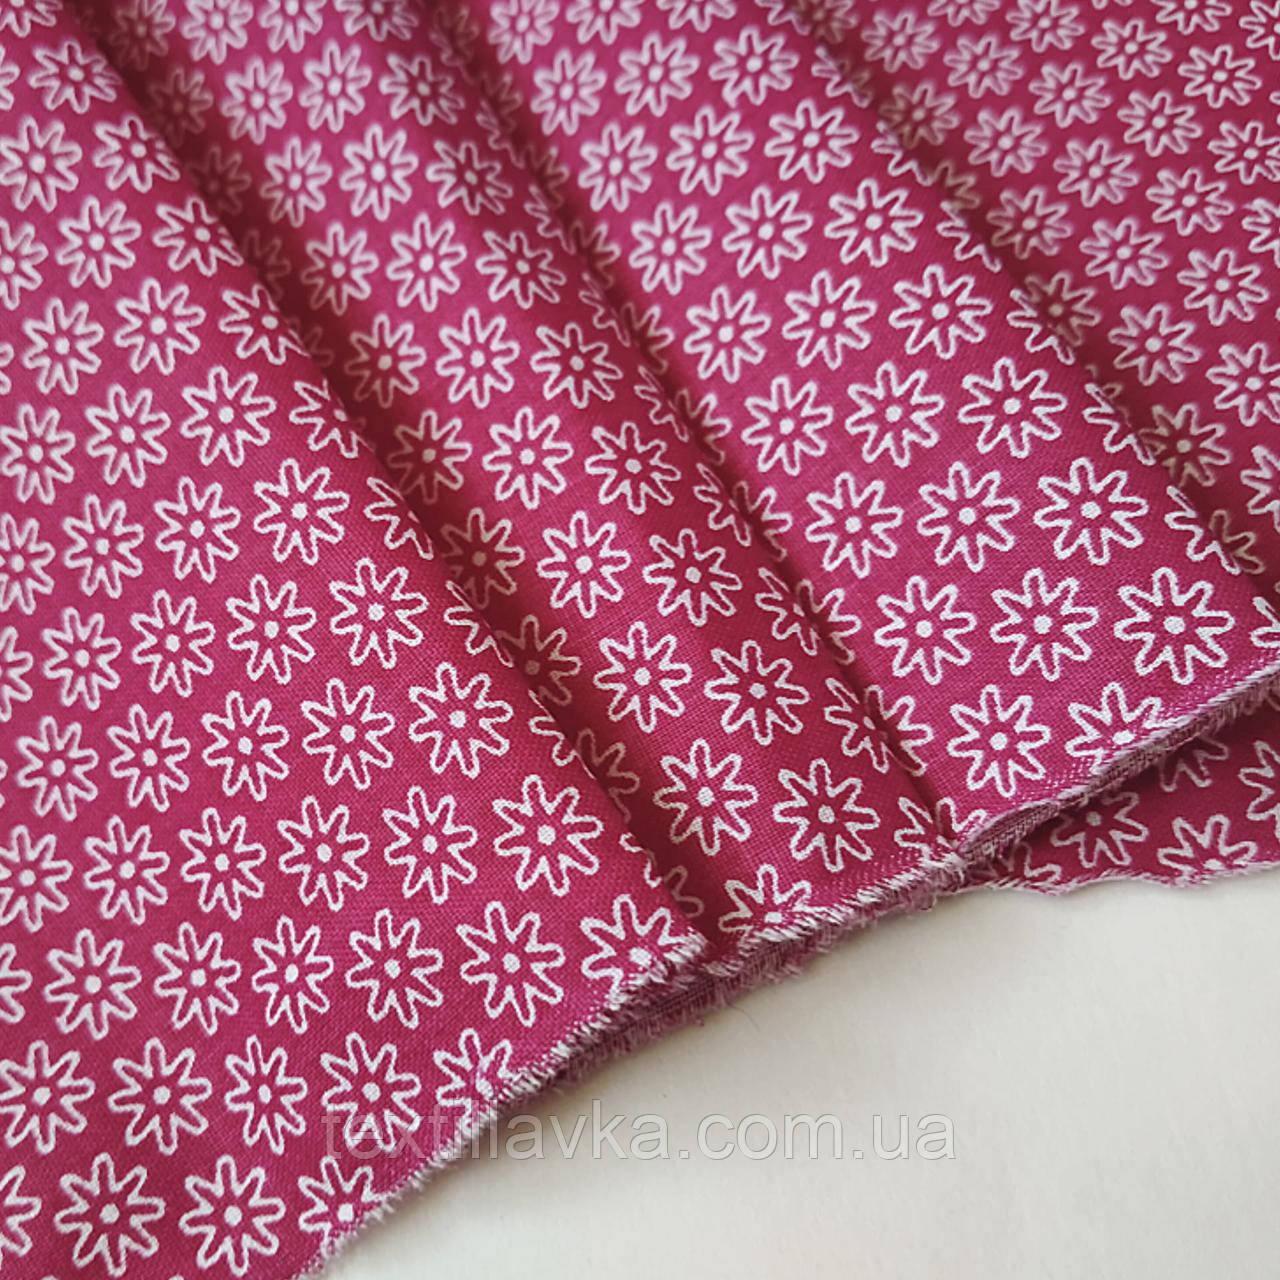 Ткань хлопок для рукоделия цветочки на темно-розовом